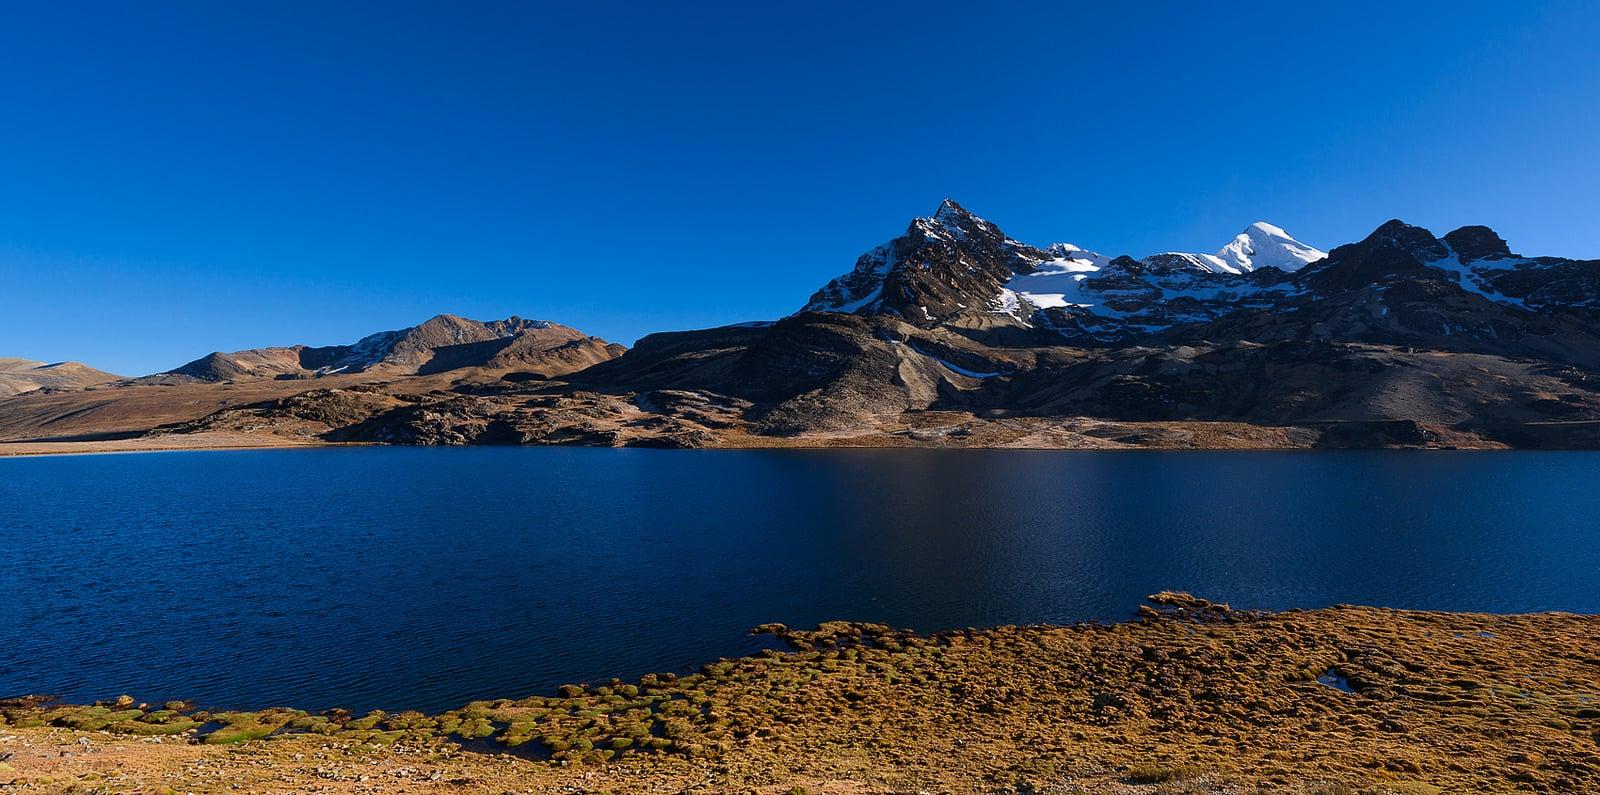 One-week guided Apolobamba trekking tour